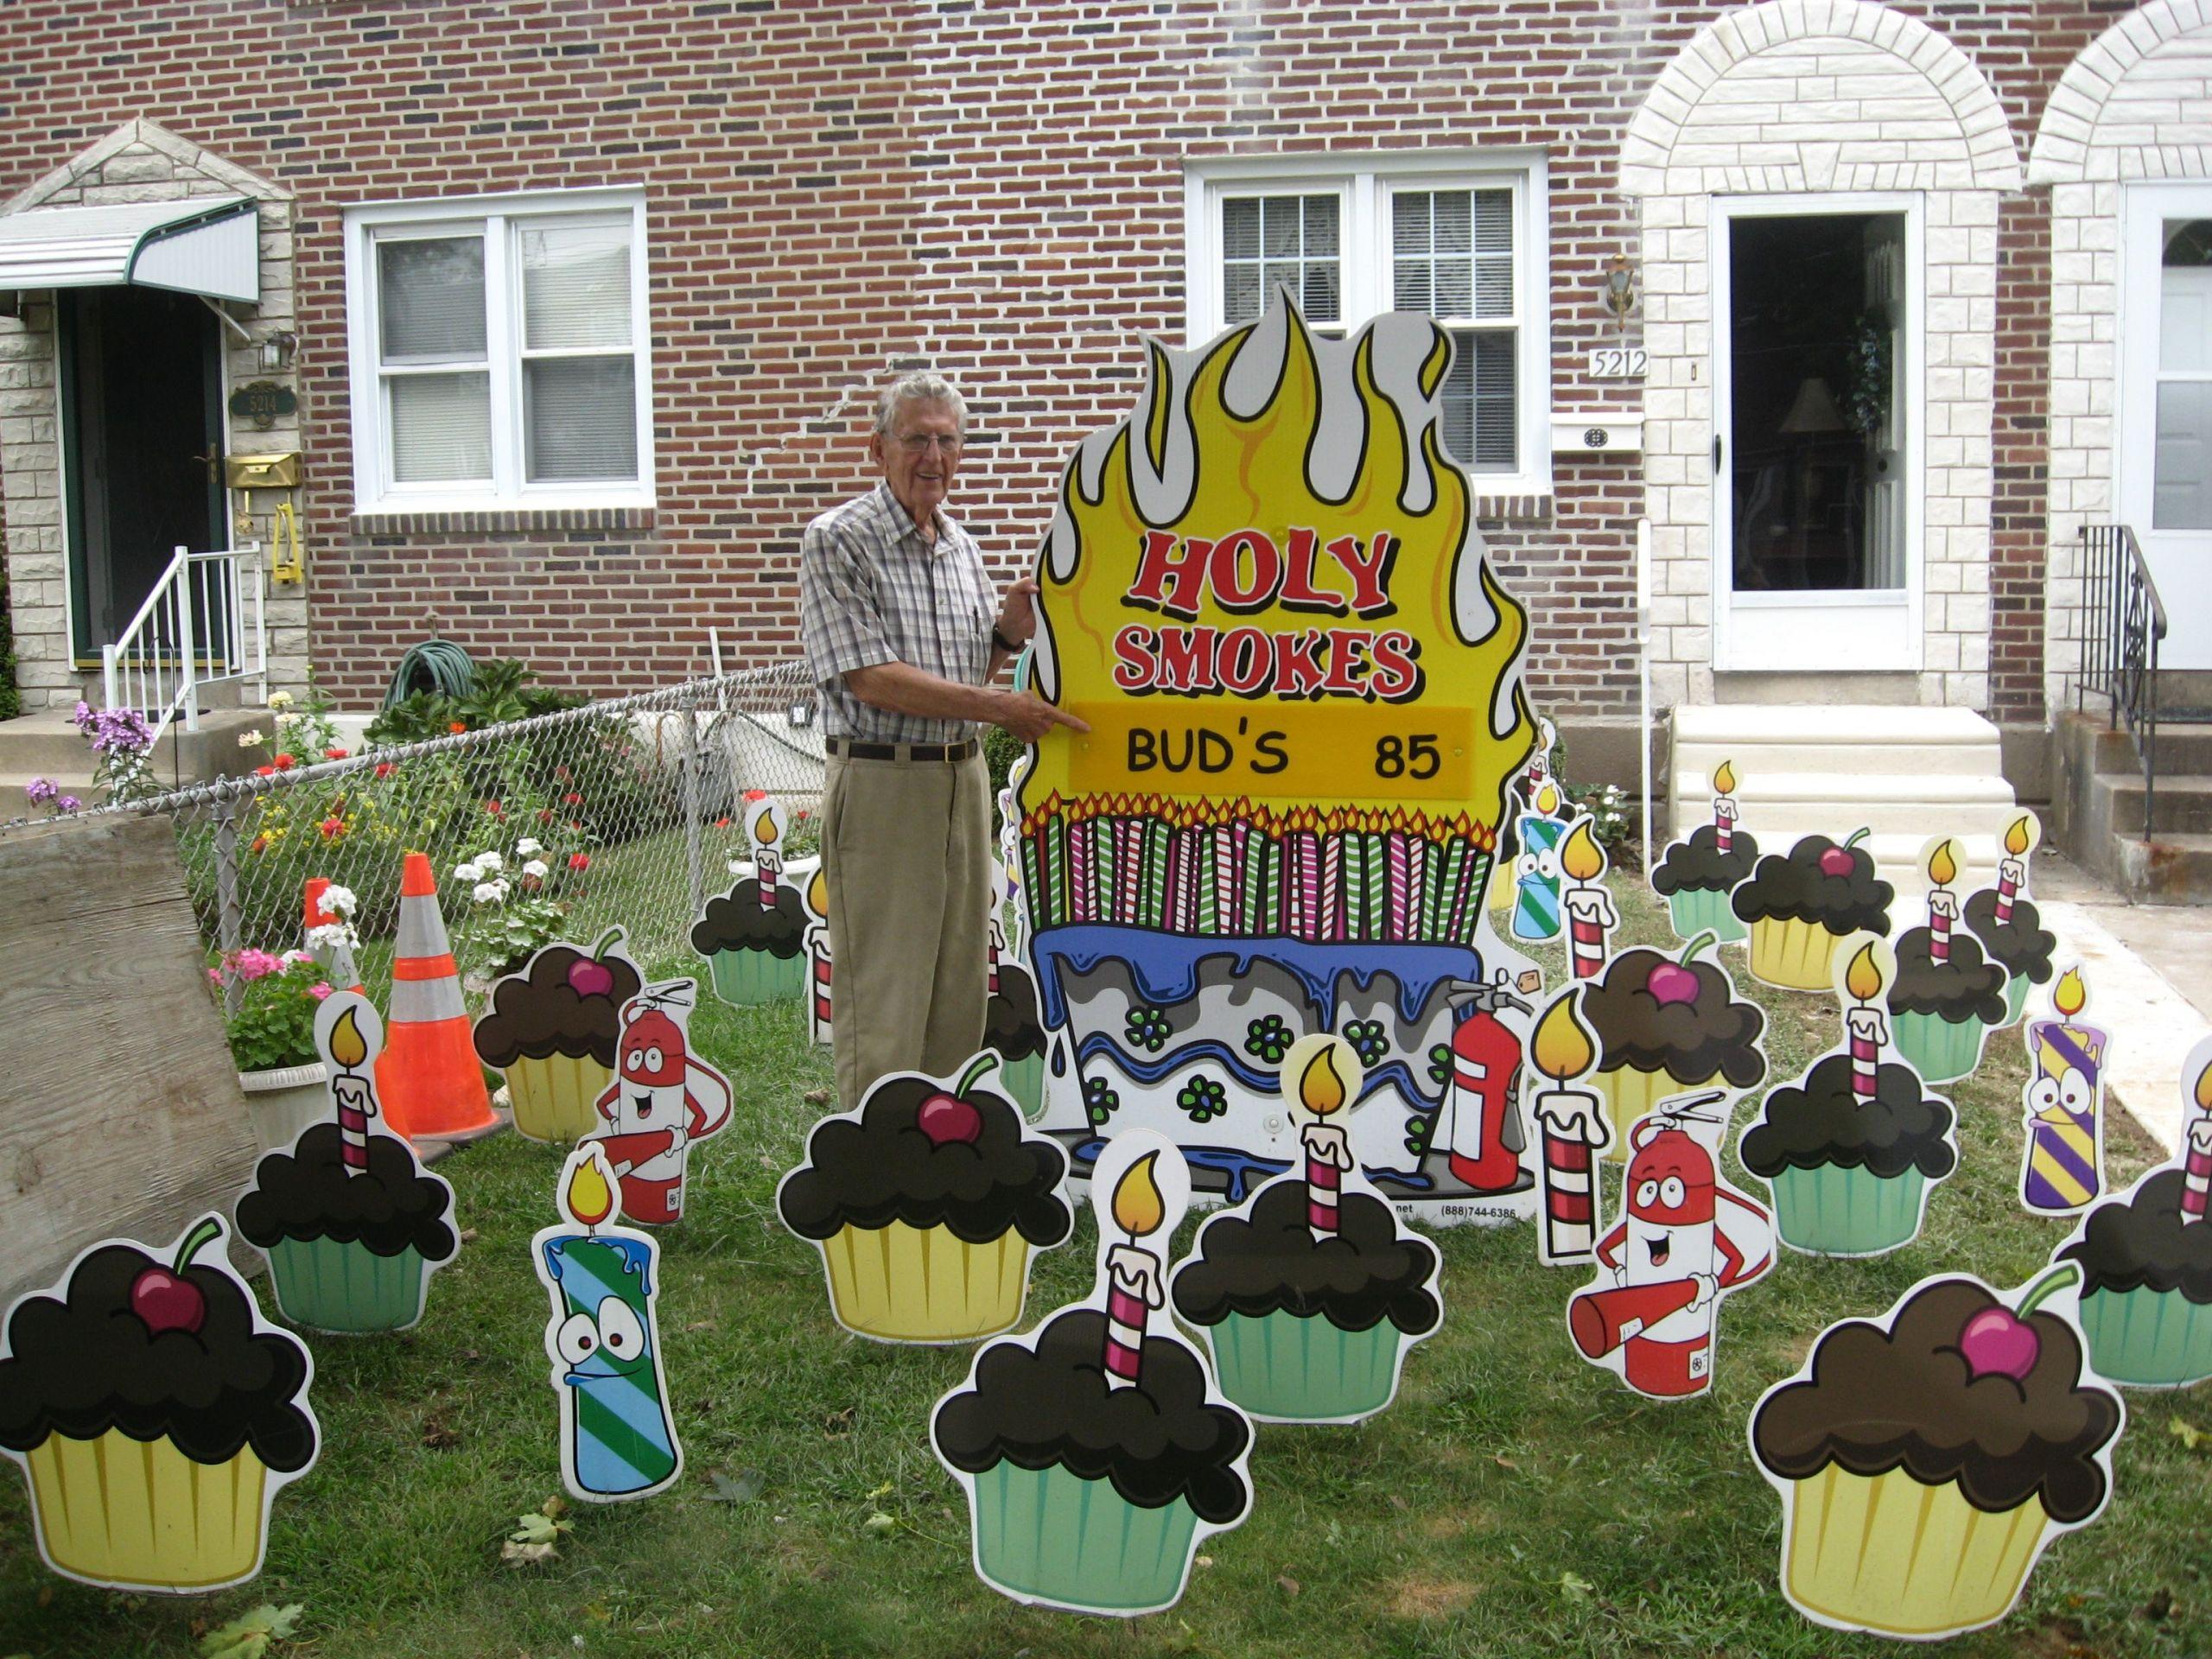 Lawn Decorations For Birthday  Yard Decorations For 50th Birthday